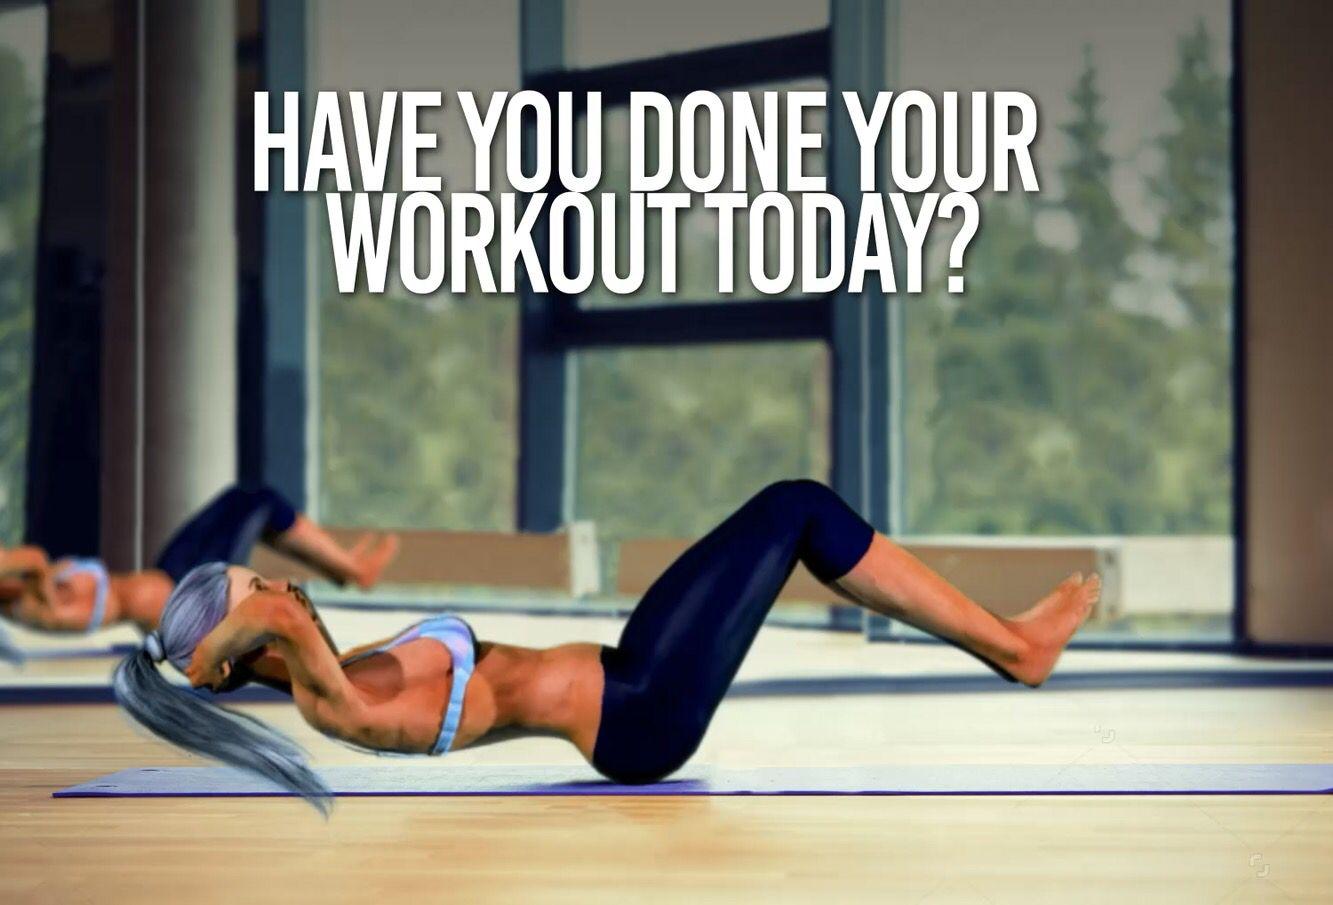 Fitonomy workout fun workouts workout apps 30 day